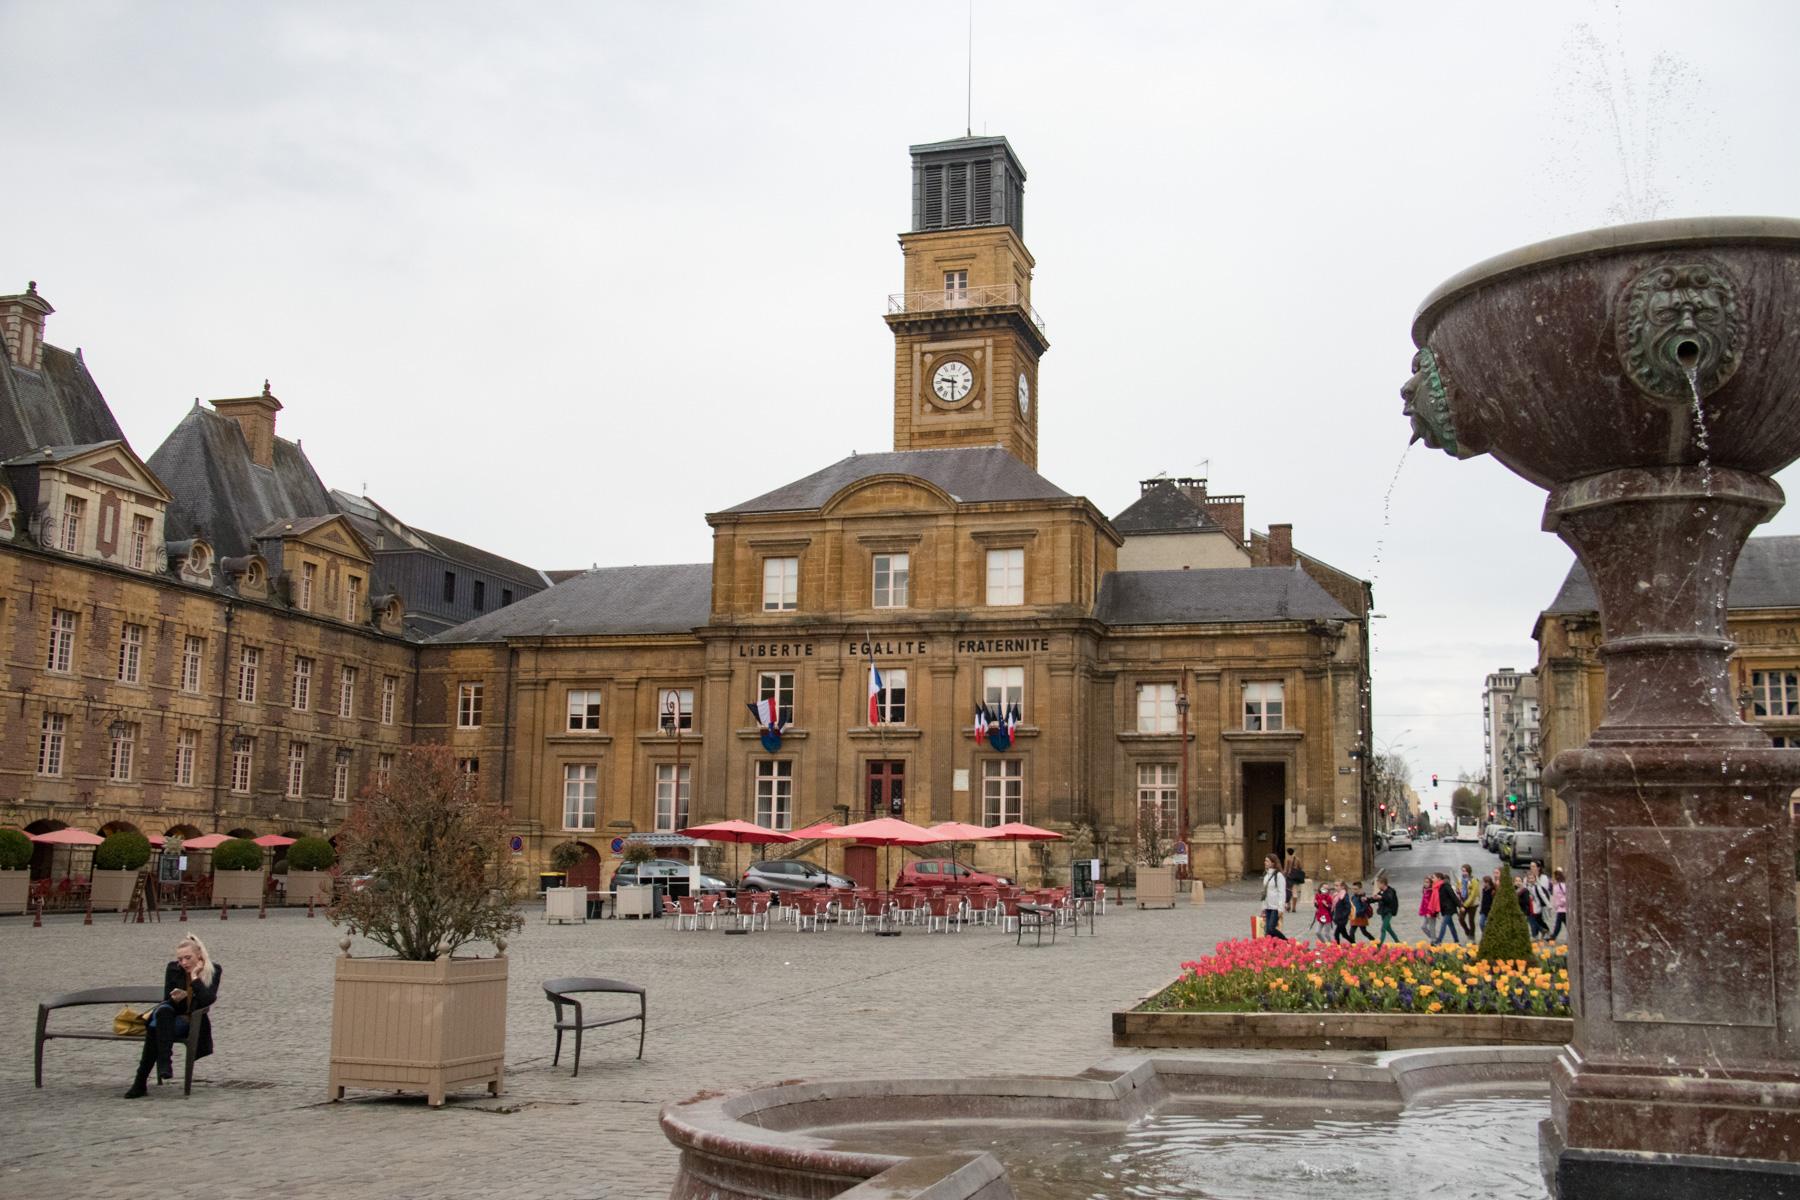 Het stadhuis van Charleville